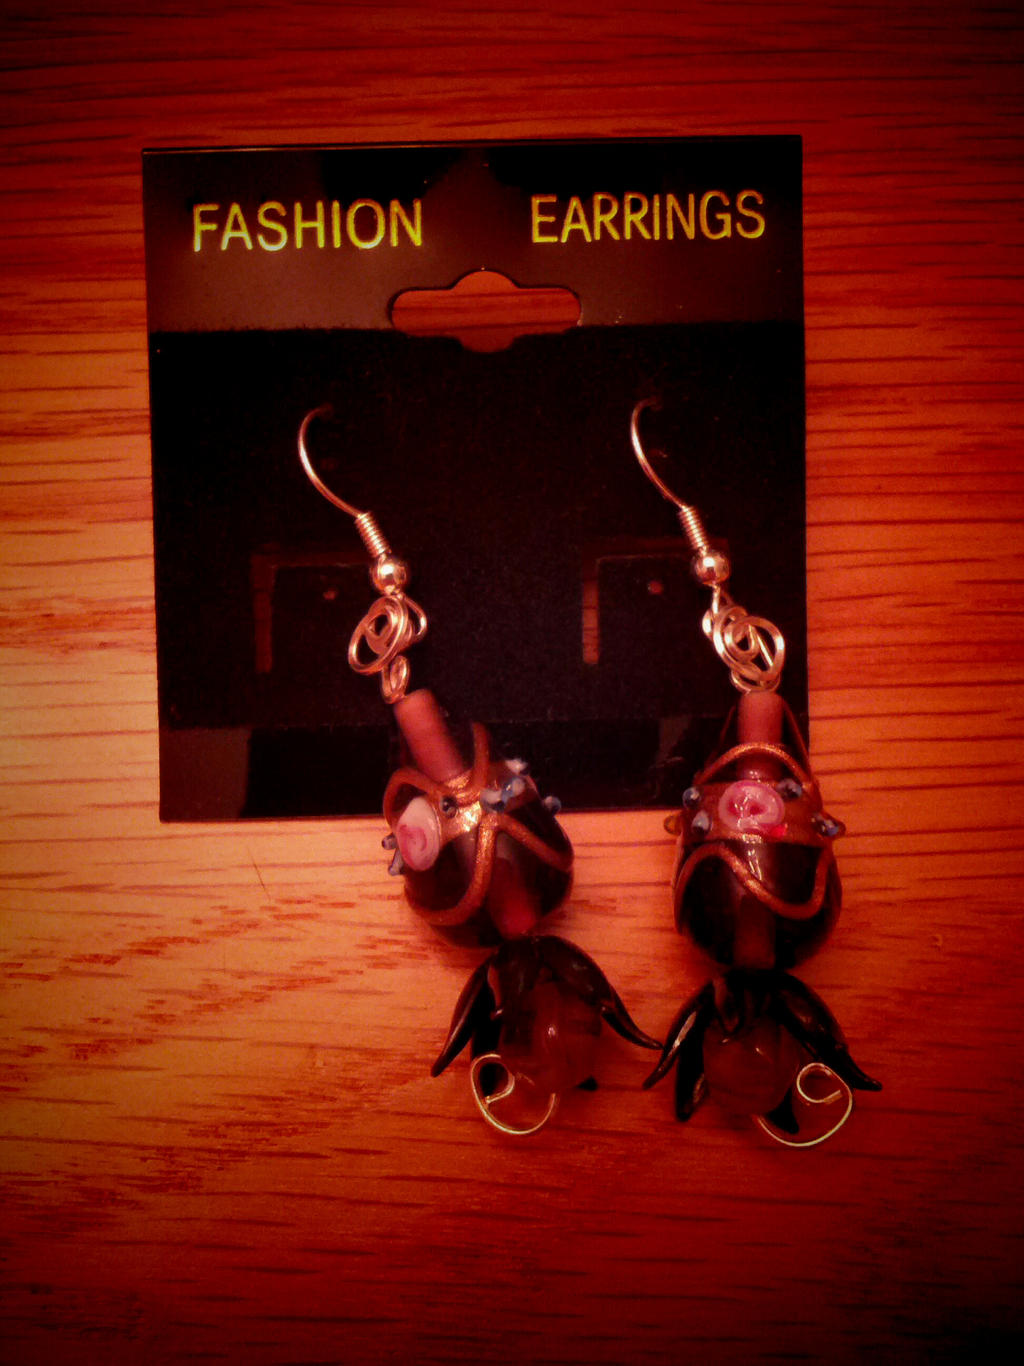 Pat's earrings